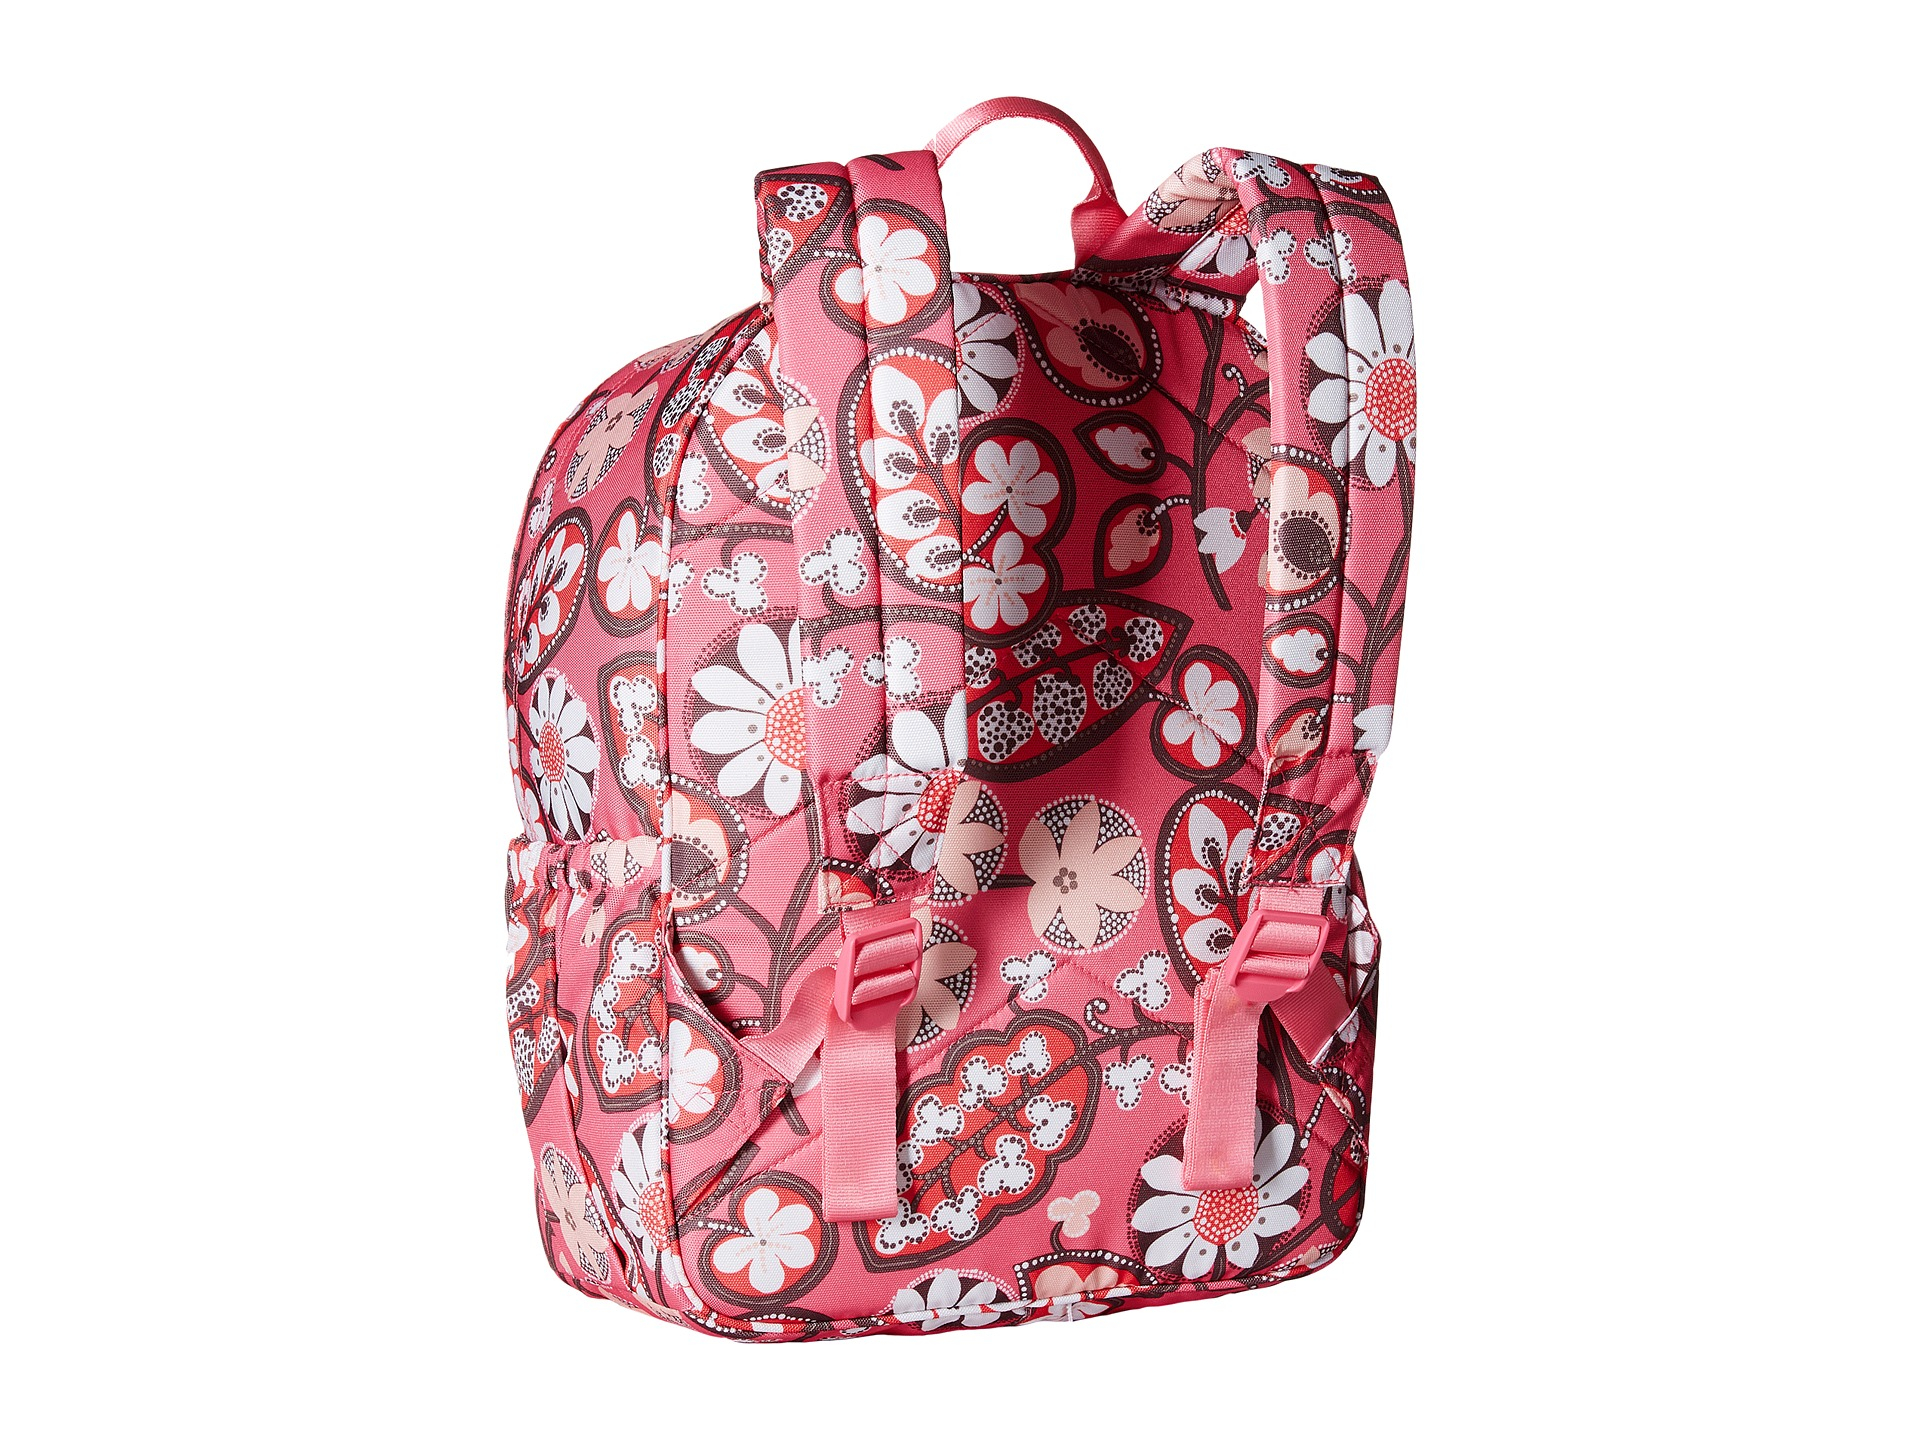 46cd970c45 Lyst - Vera Bradley Lighten Up Just Right Backpack in Pink